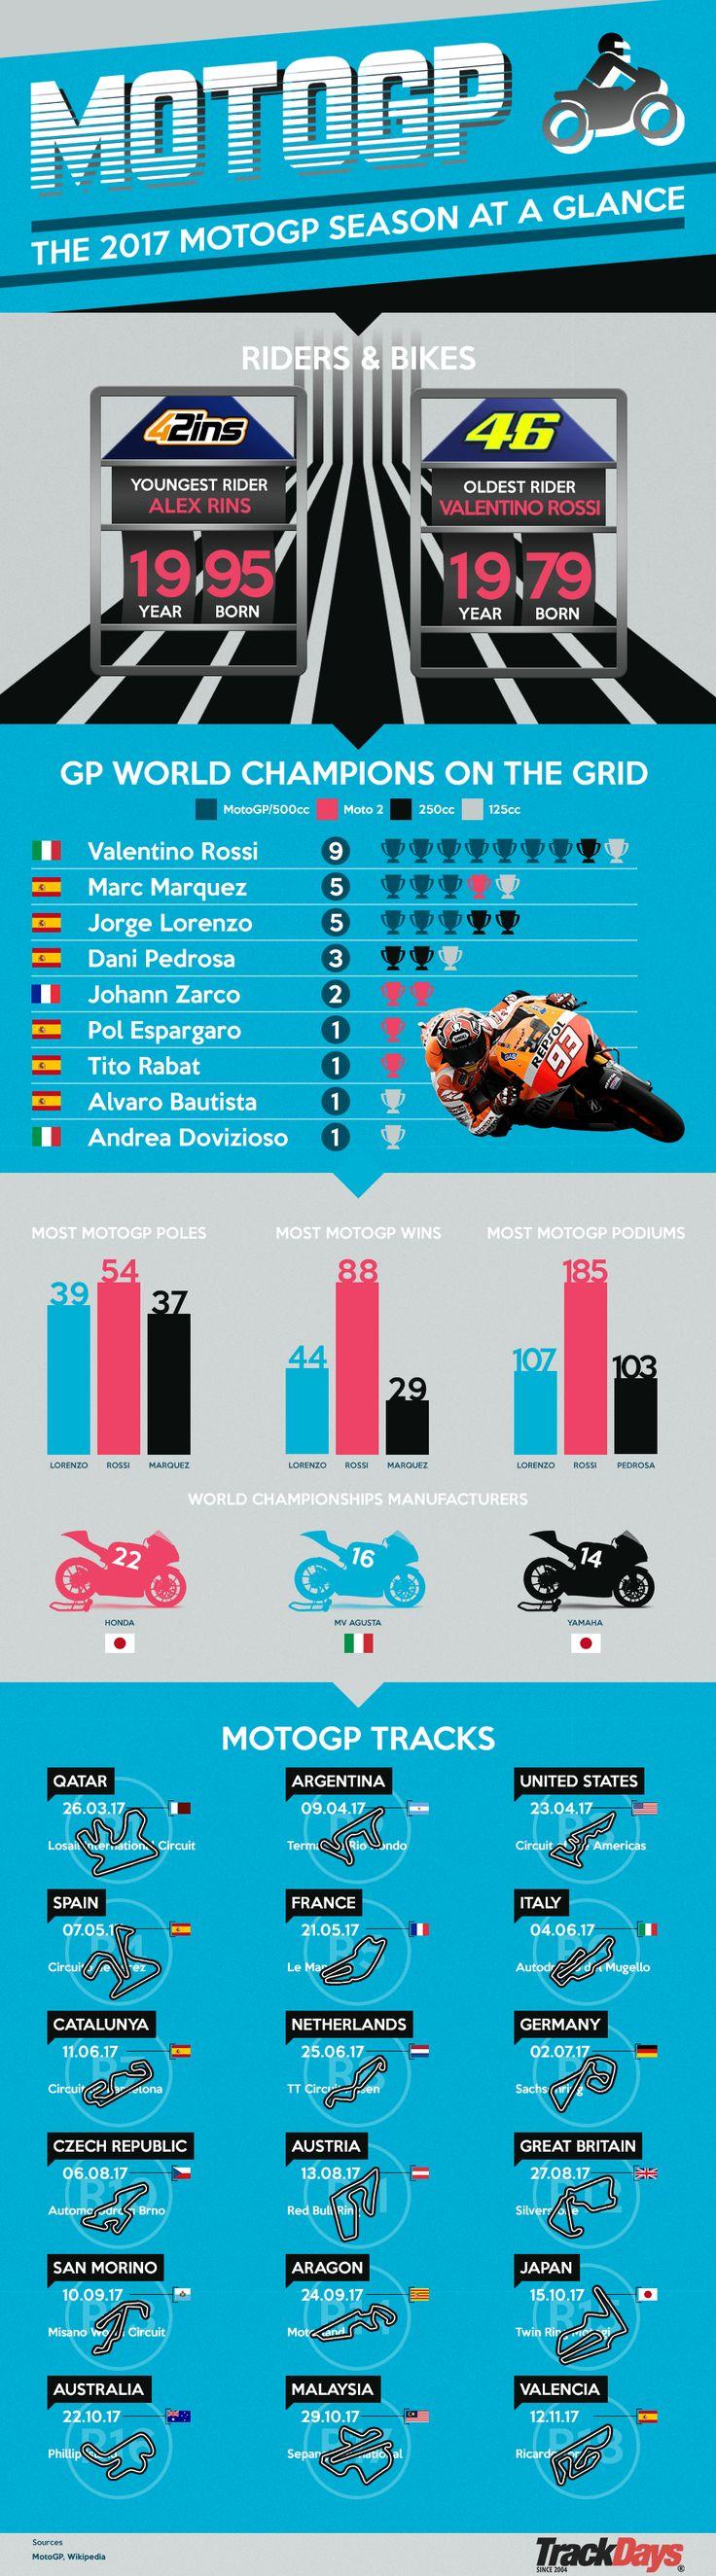 MotoGP 2017 Season At A Glance. #Infographic #MotoGP #Motorbike #Motorsport #Graphic